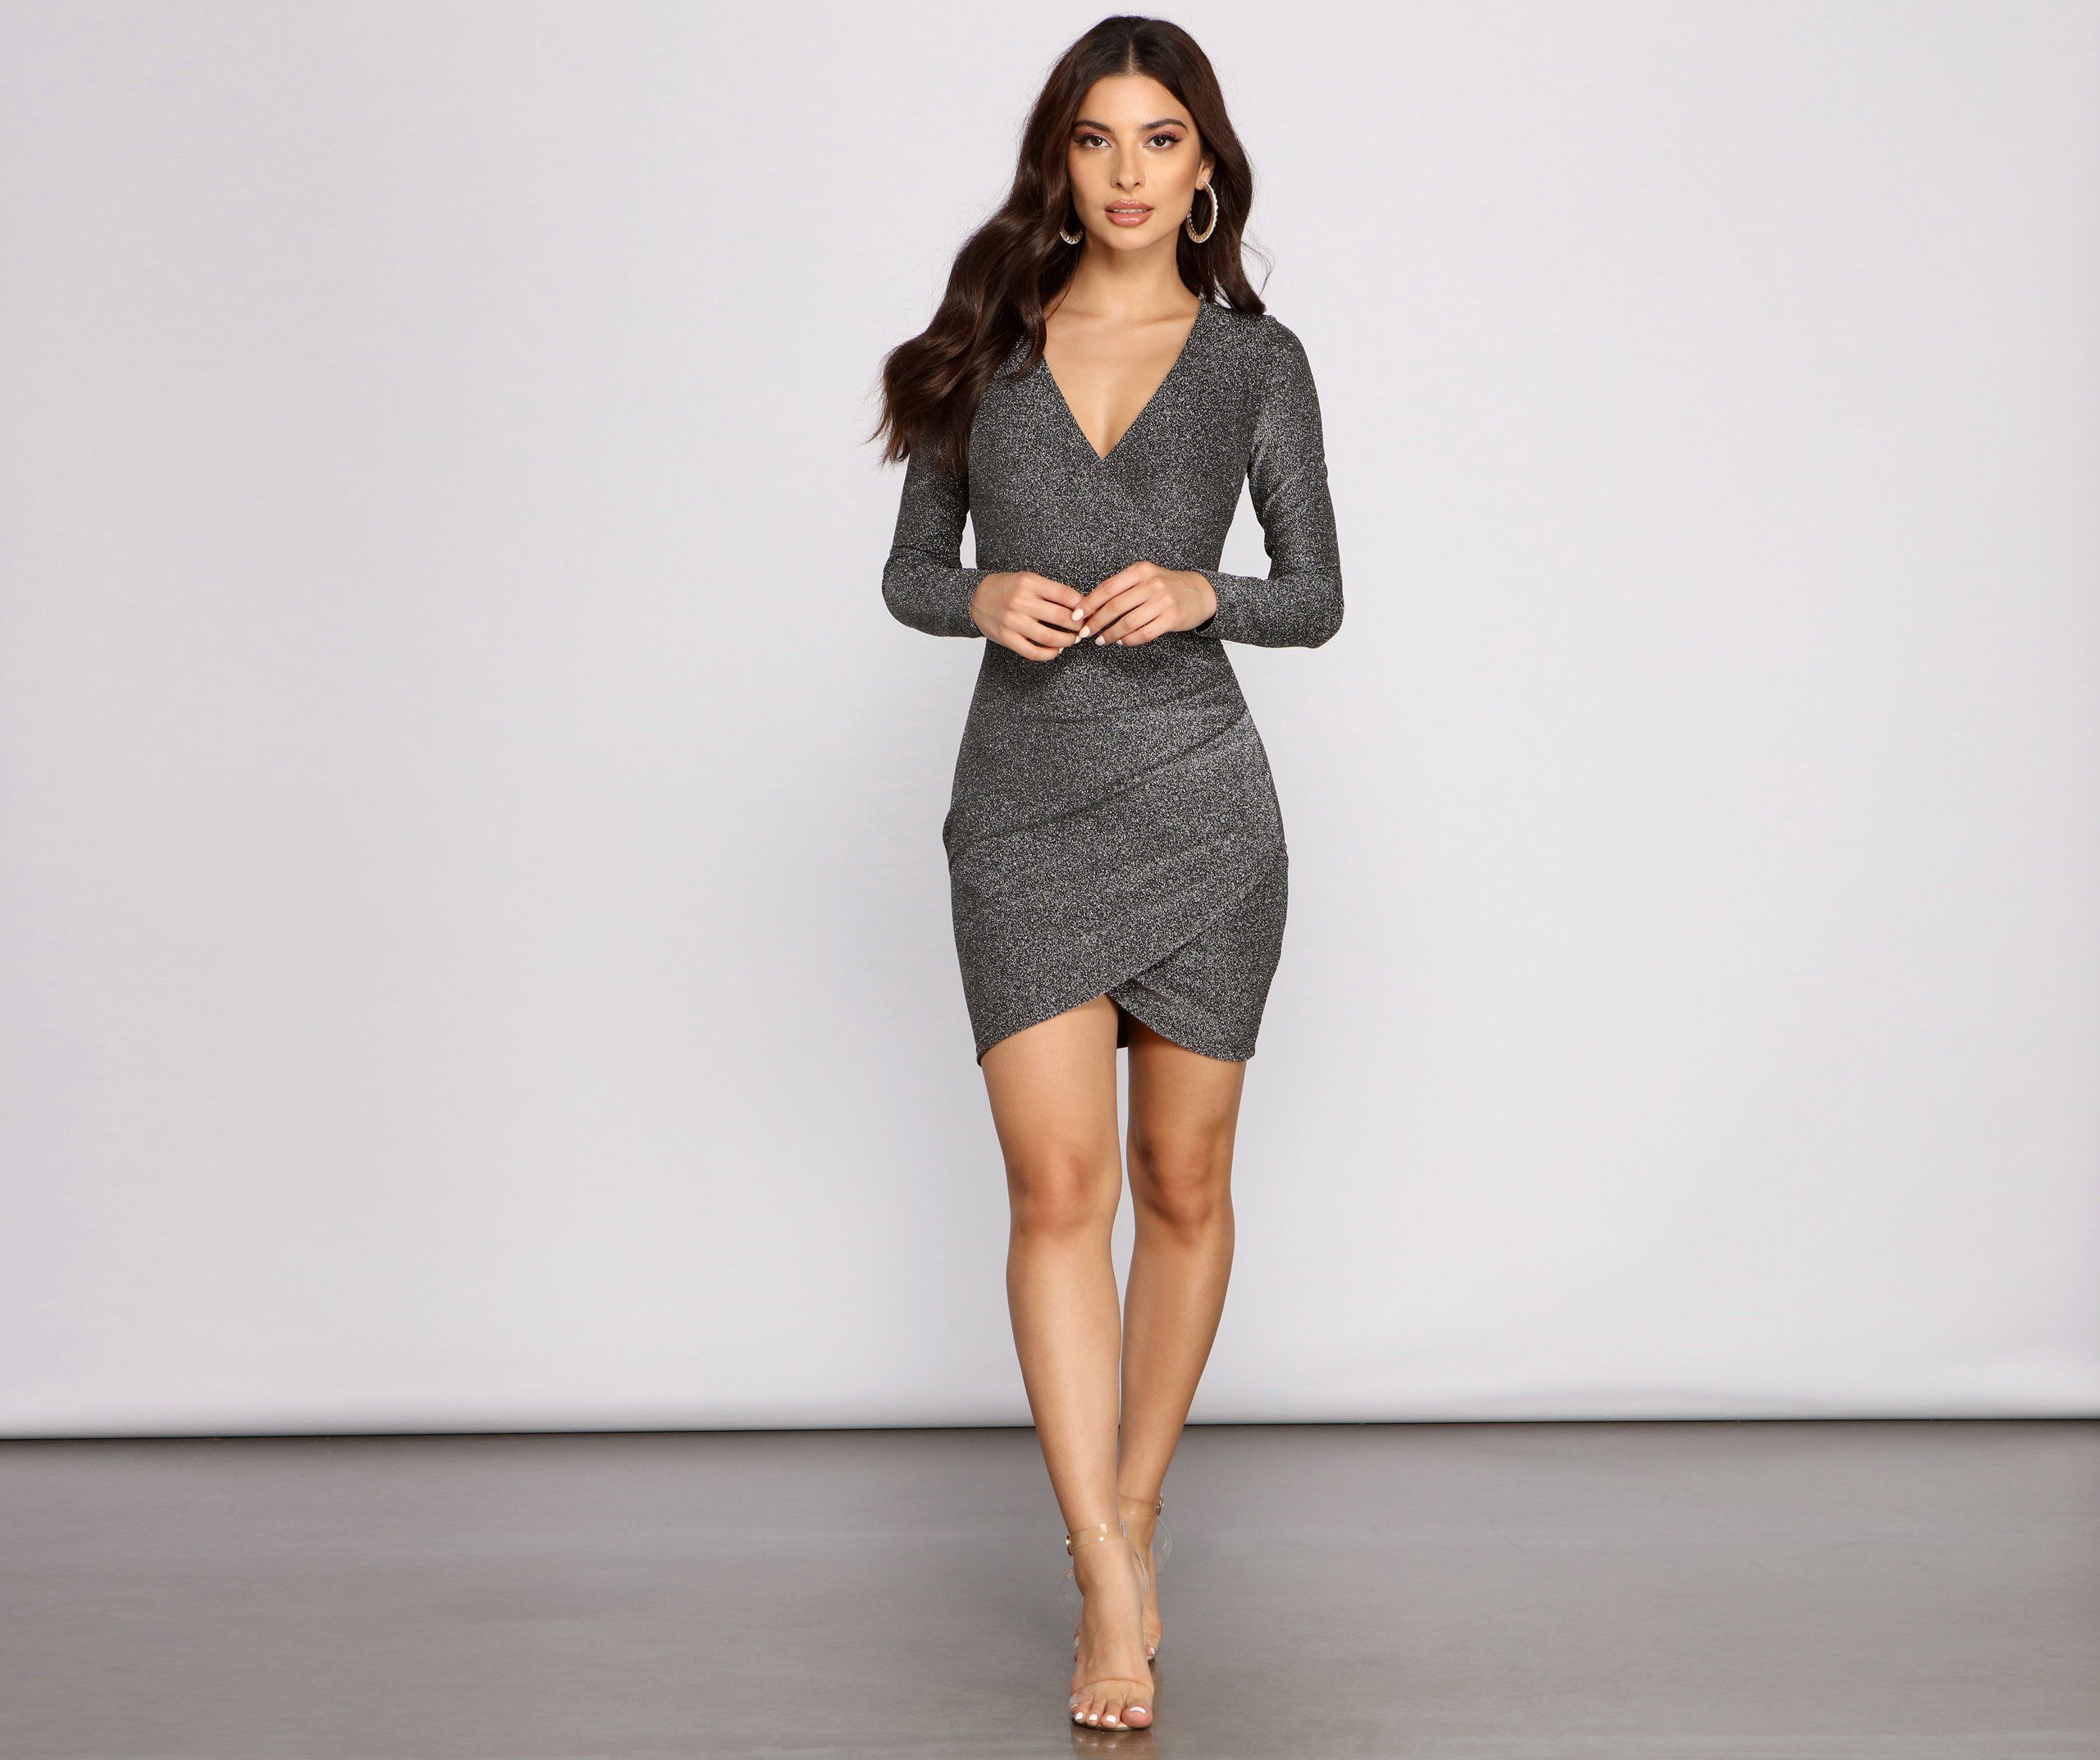 Glitter And Glam Long Sleeve Mini Dress In 2021 Long Sleeve Mini Dress Mini Dress Long Sleeve Mini [ 2145 x 2560 Pixel ]